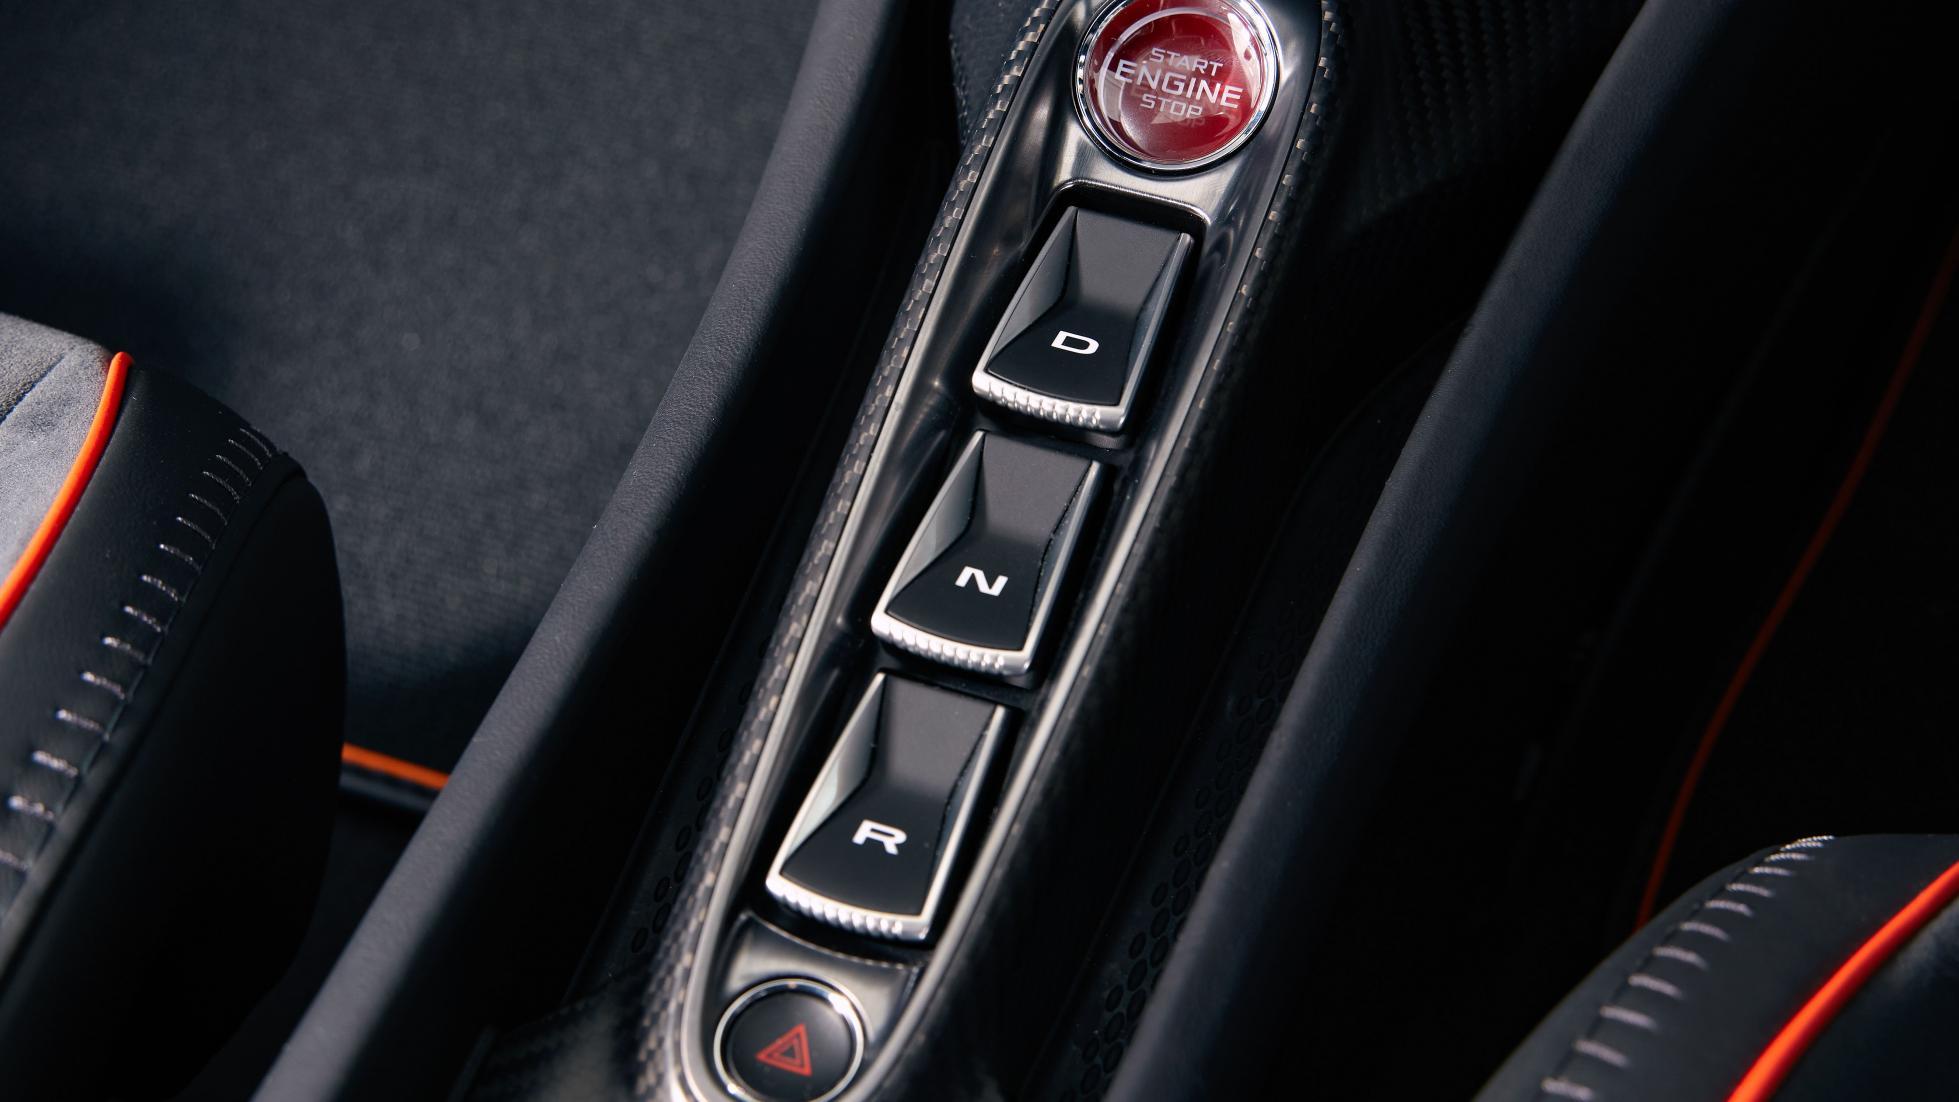 McLaren Artura center console controls